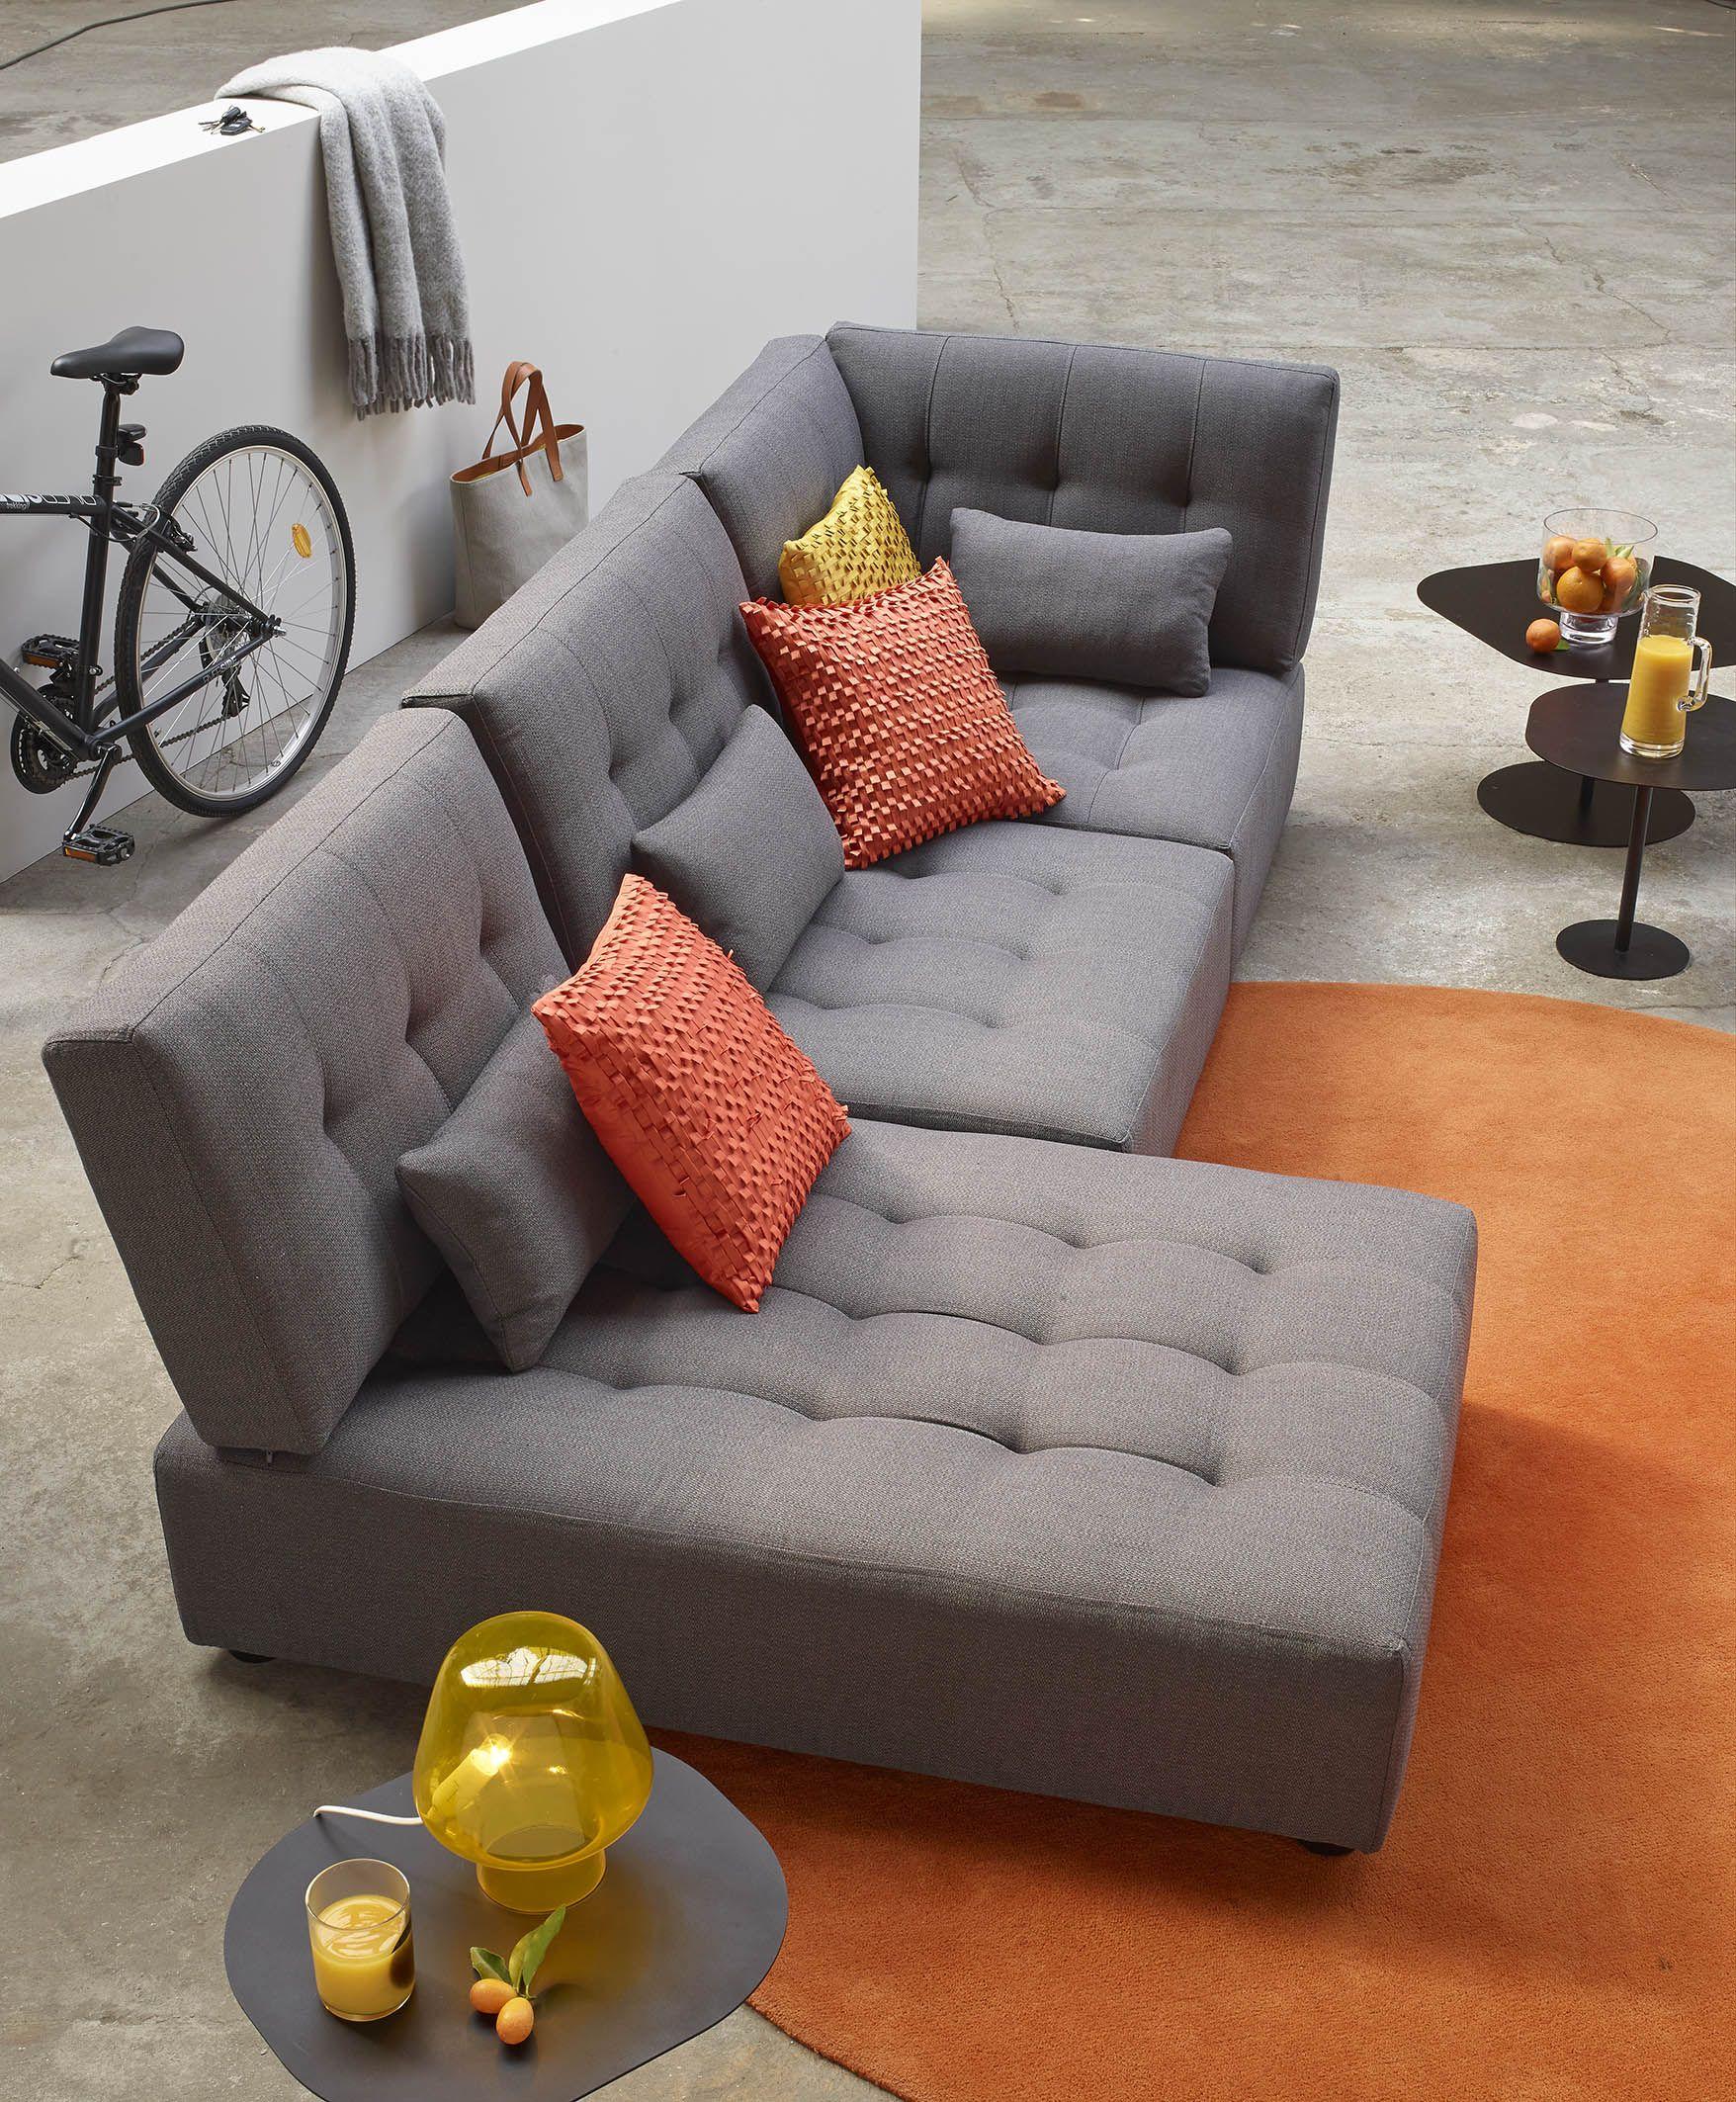 modulsoffa reiko habitatsverige module sofa pinterest. Black Bedroom Furniture Sets. Home Design Ideas